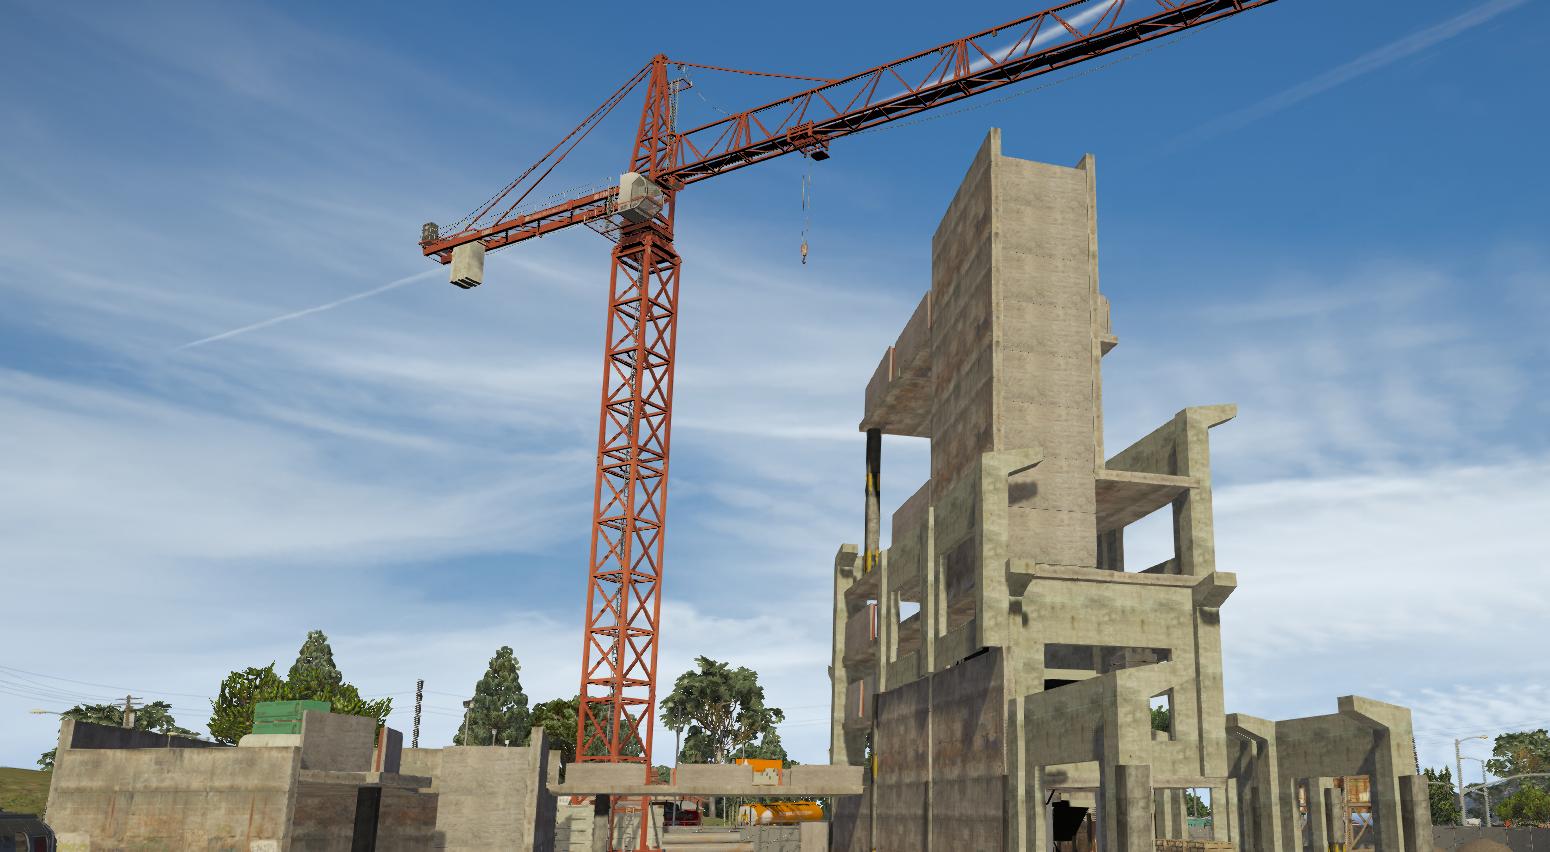 Construction Site Security | WESTEX